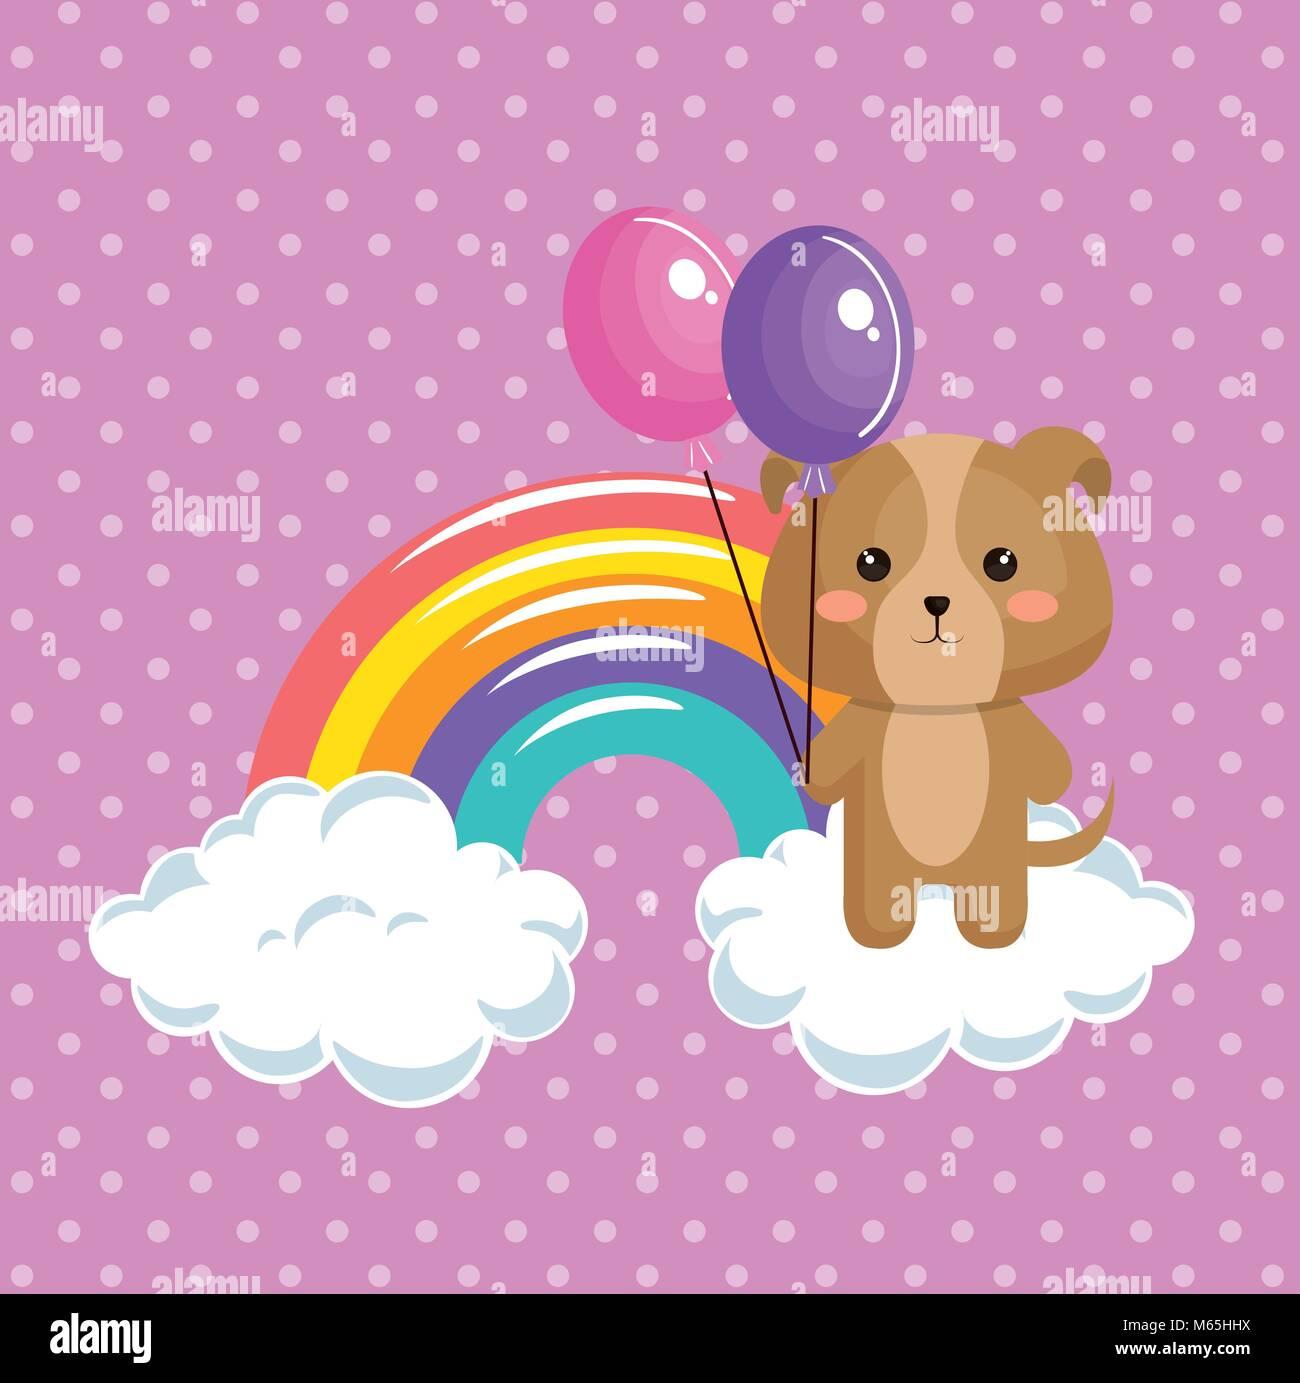 cute dog with rainbow kawaii birthday card - Stock Image